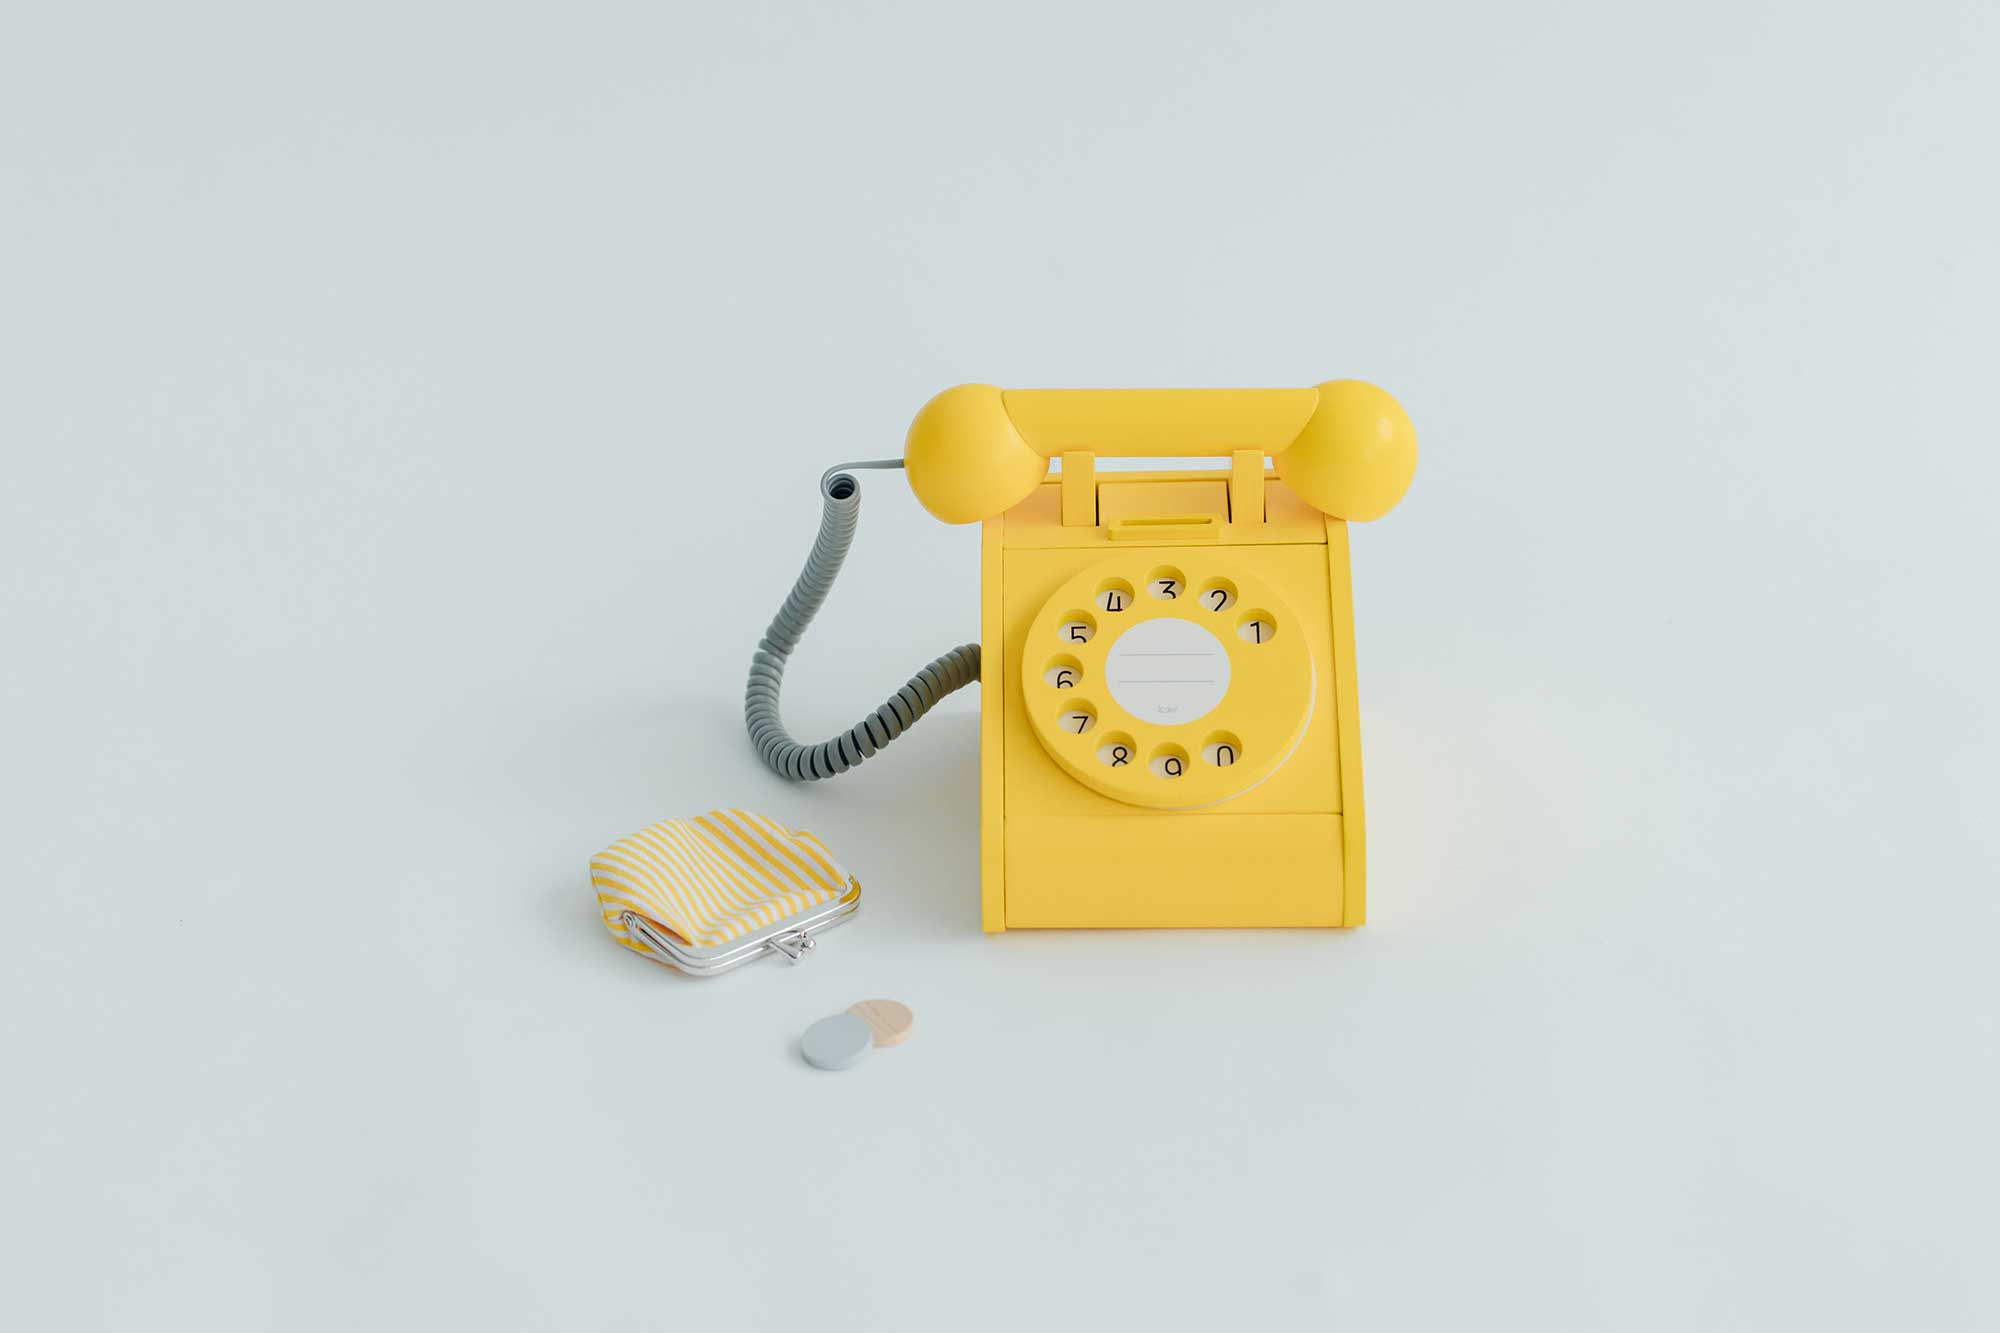 kiko+ telephone